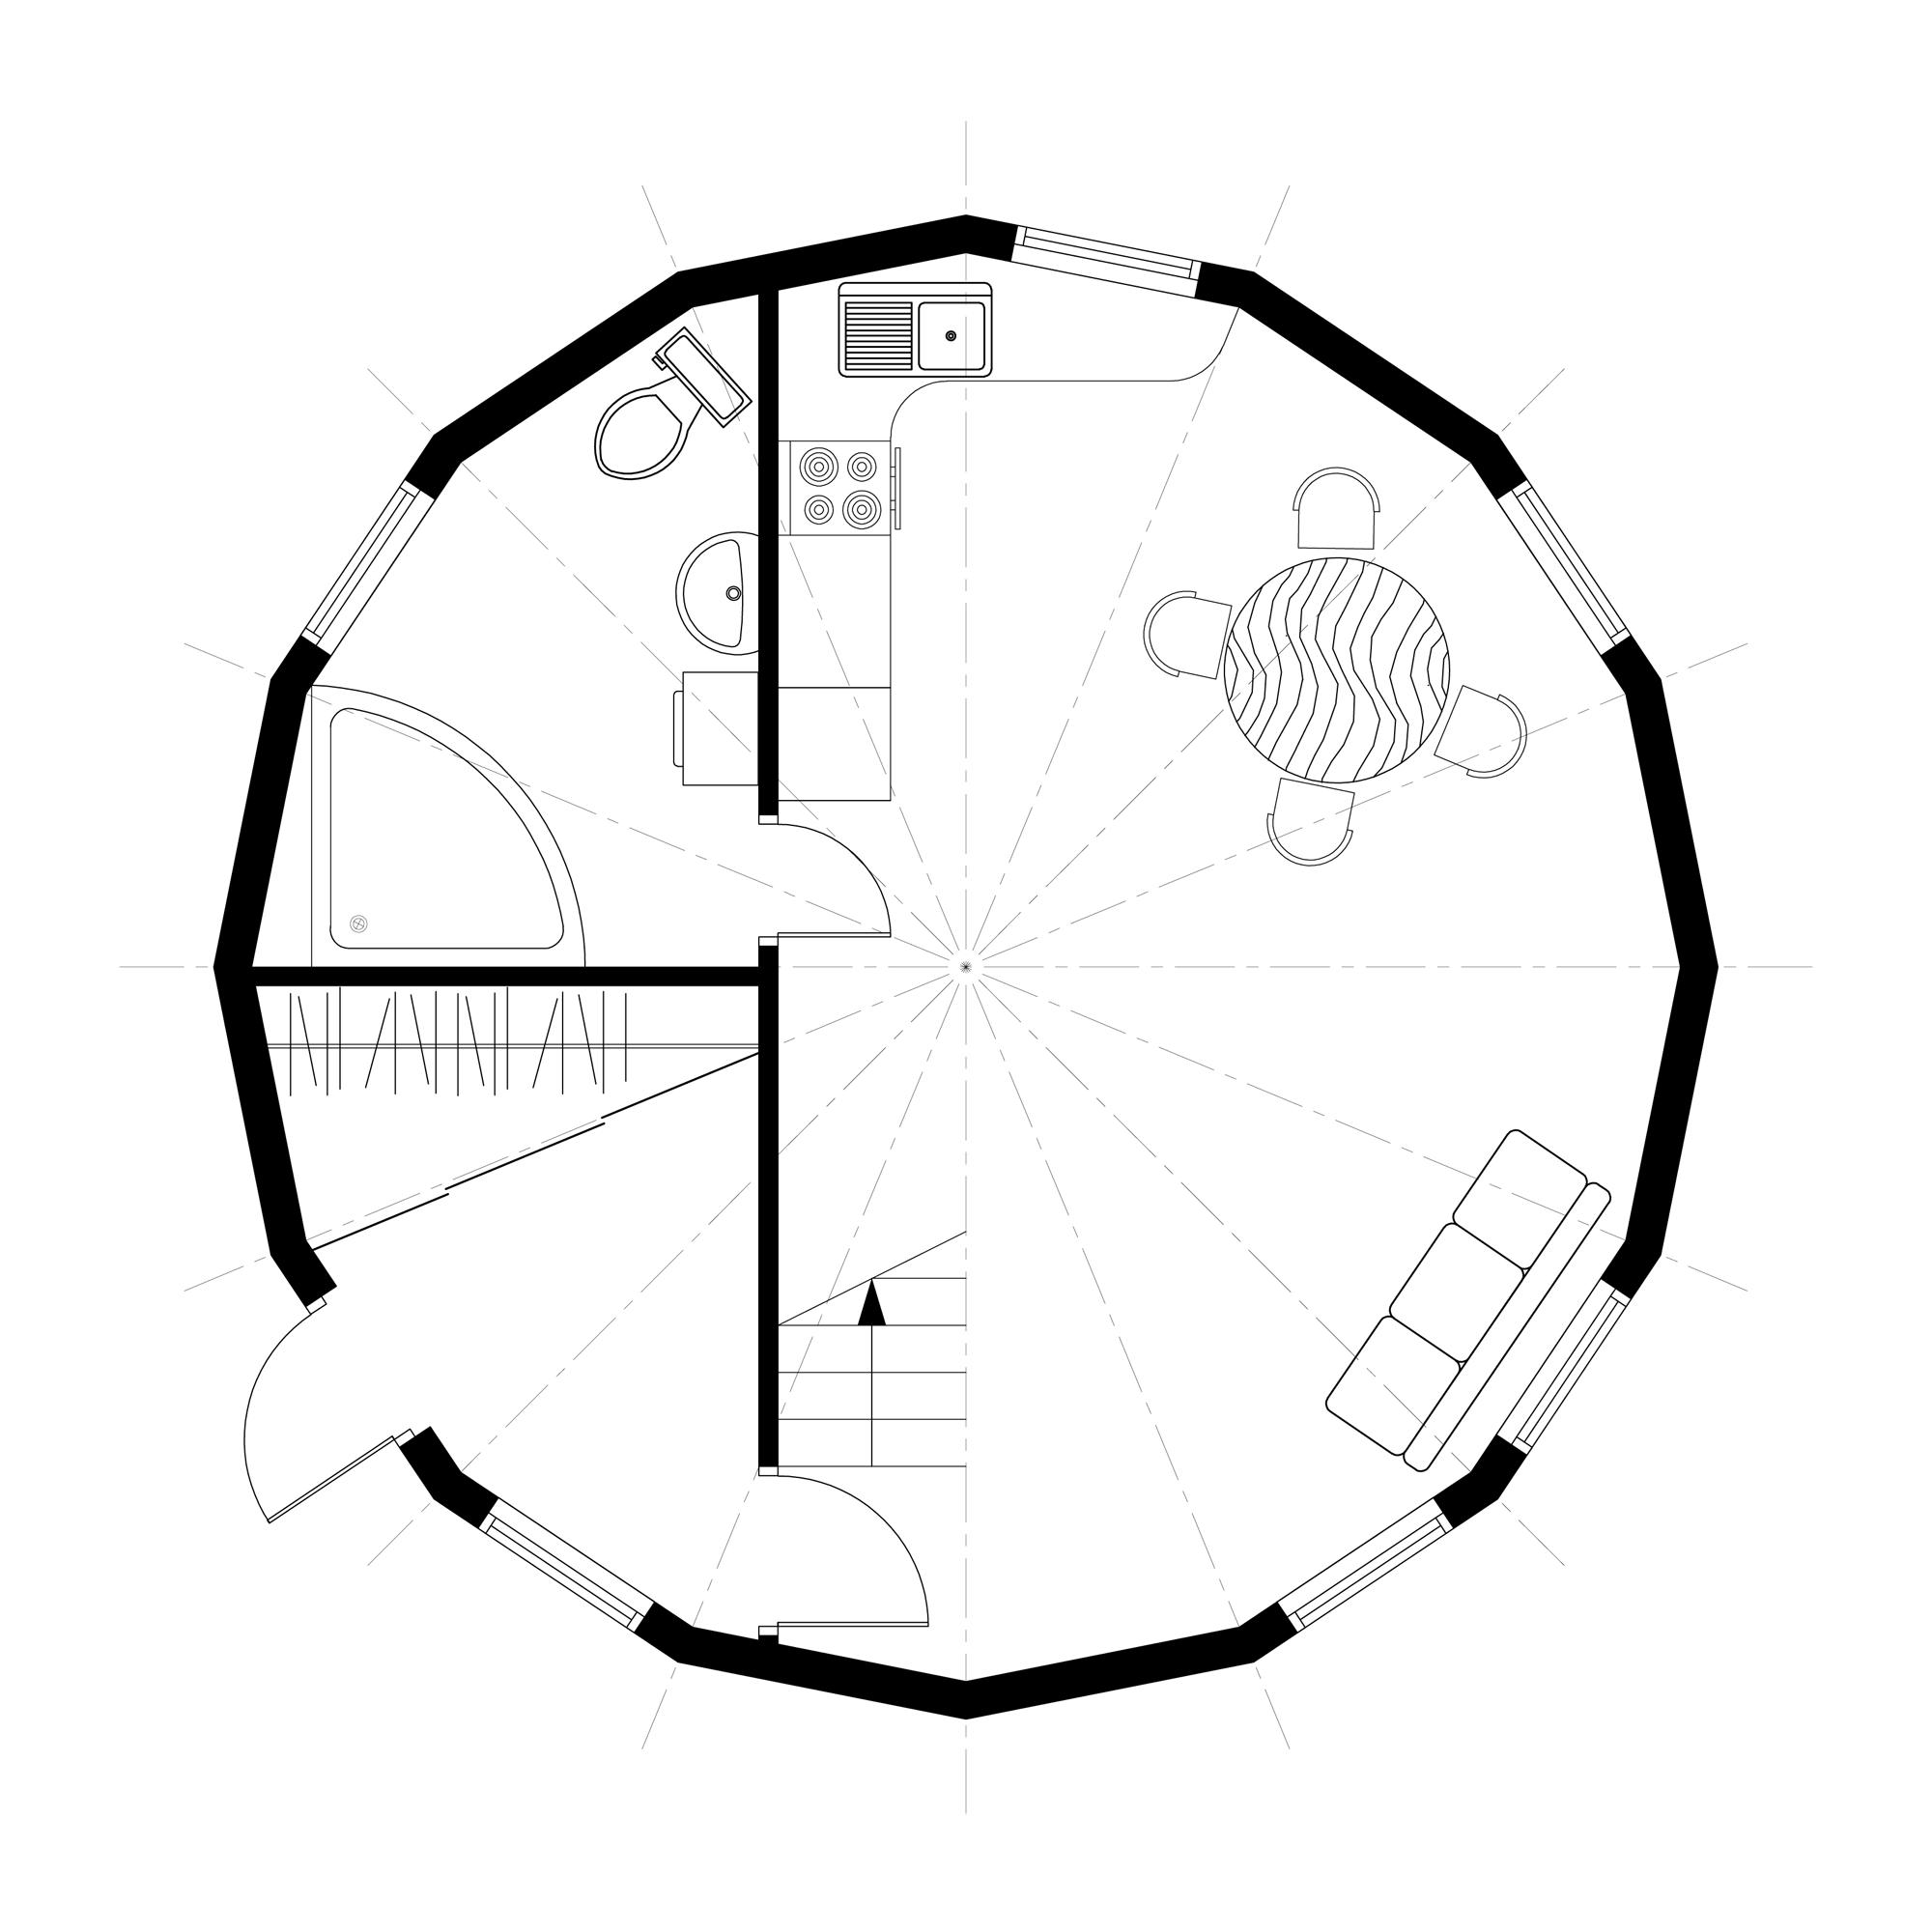 dom-sfera-v-permi-planirovka6.png - 311.45 kB